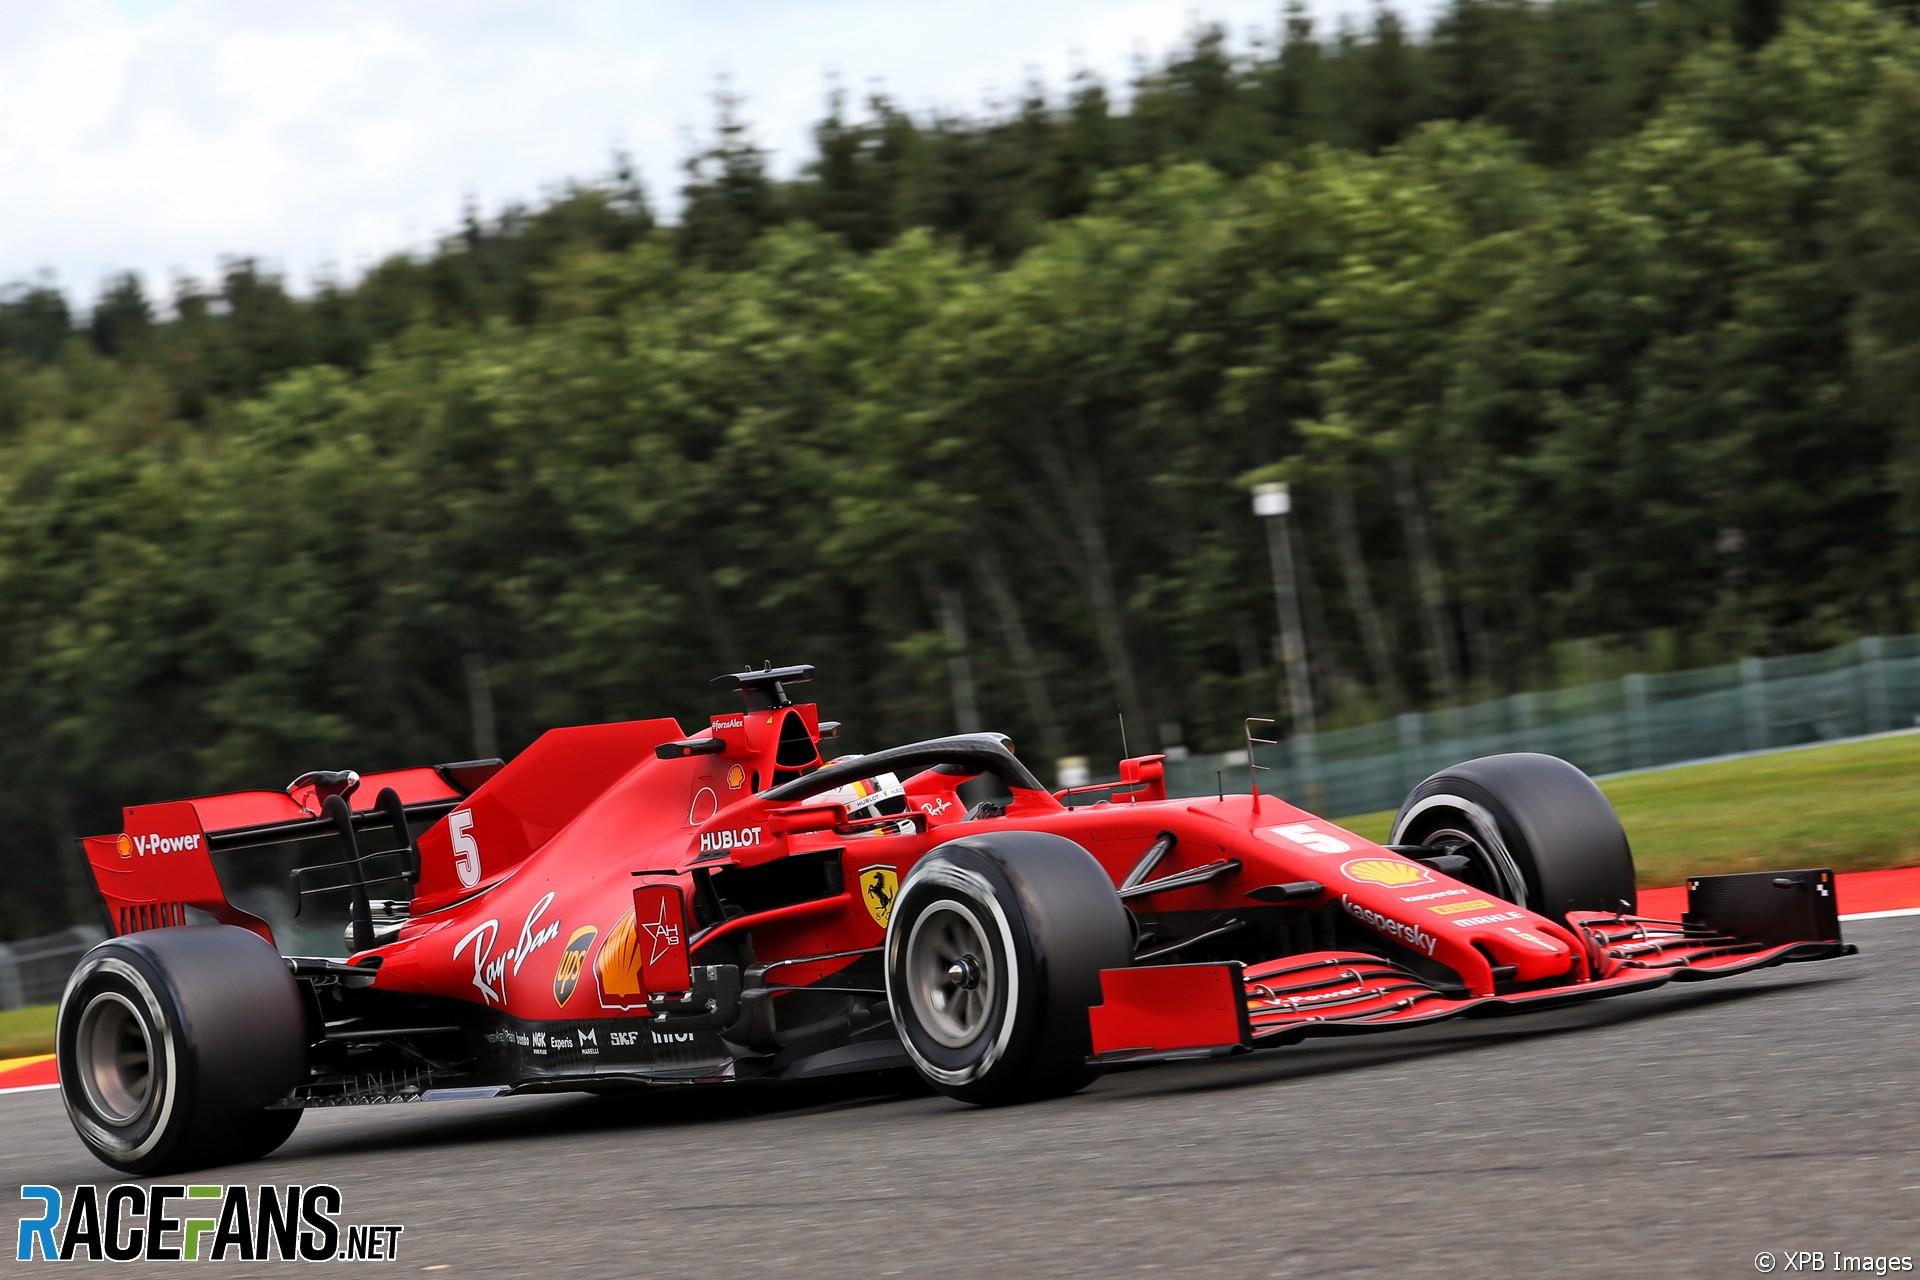 Sebastian Vettel, Ferrari, Spa-Francorchamps, 2020